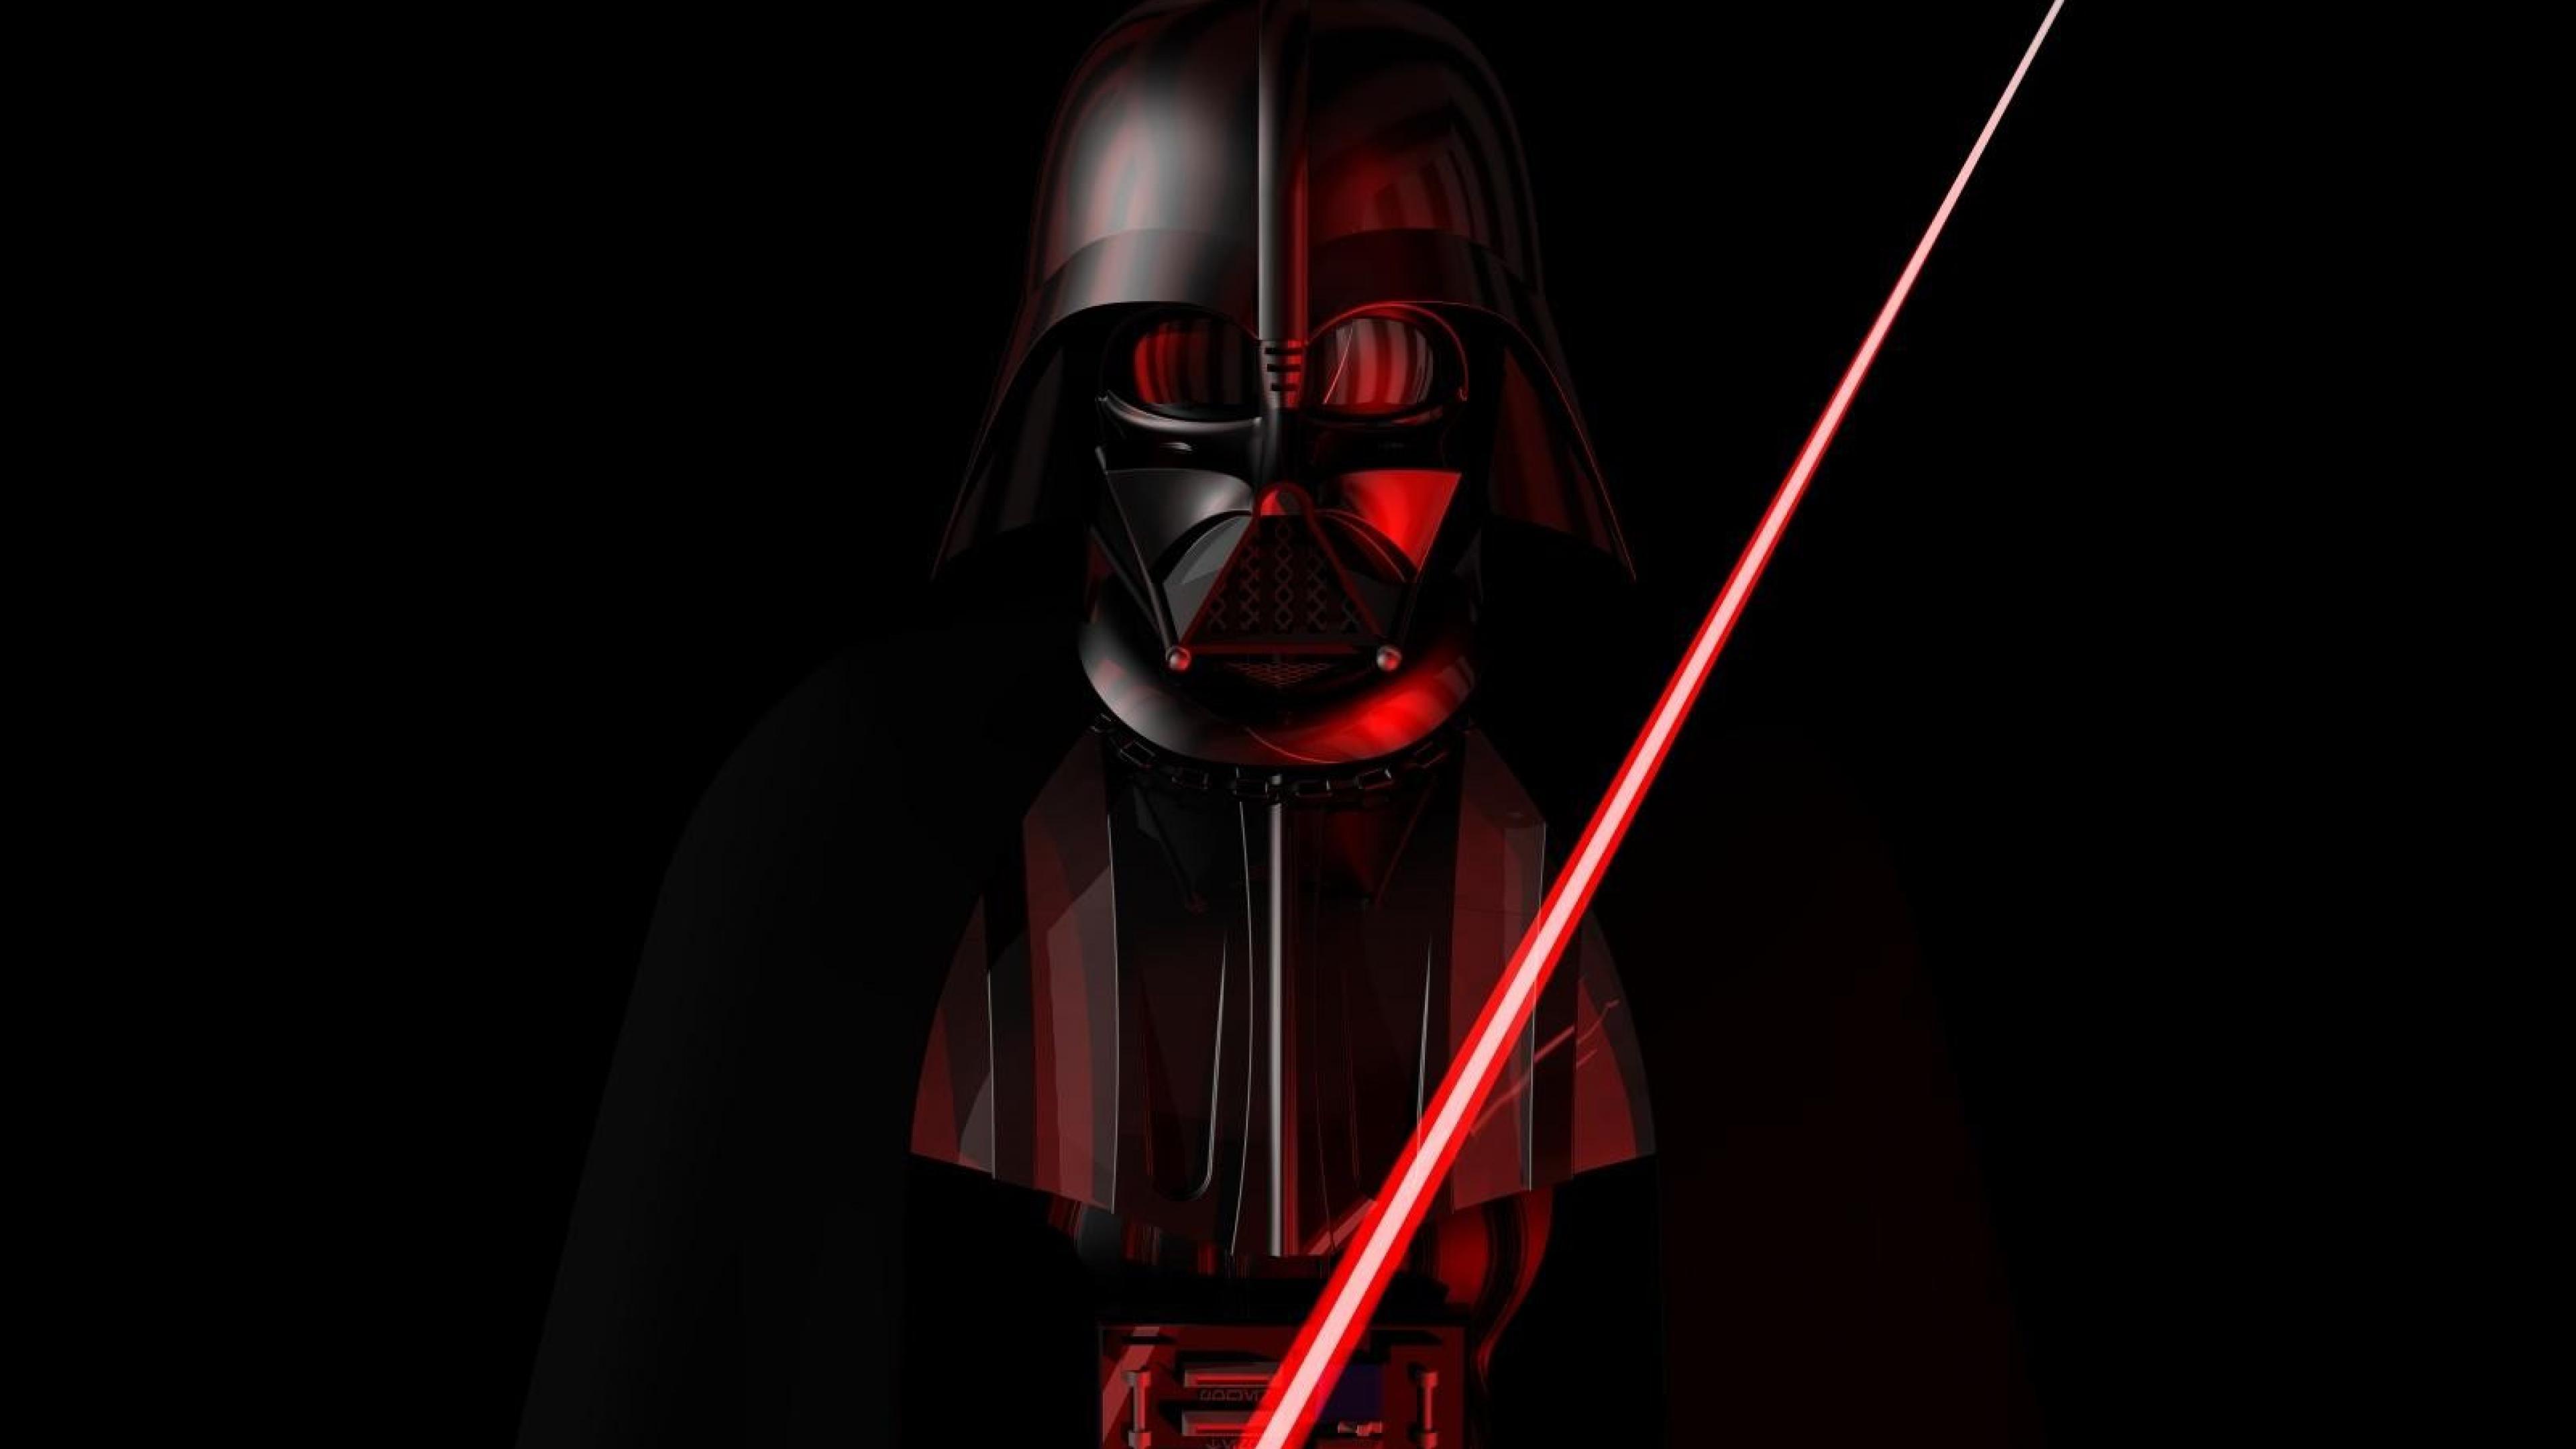 Star Wars Ultrawide Wallpaper: Star War Wallpaper Ultra HD